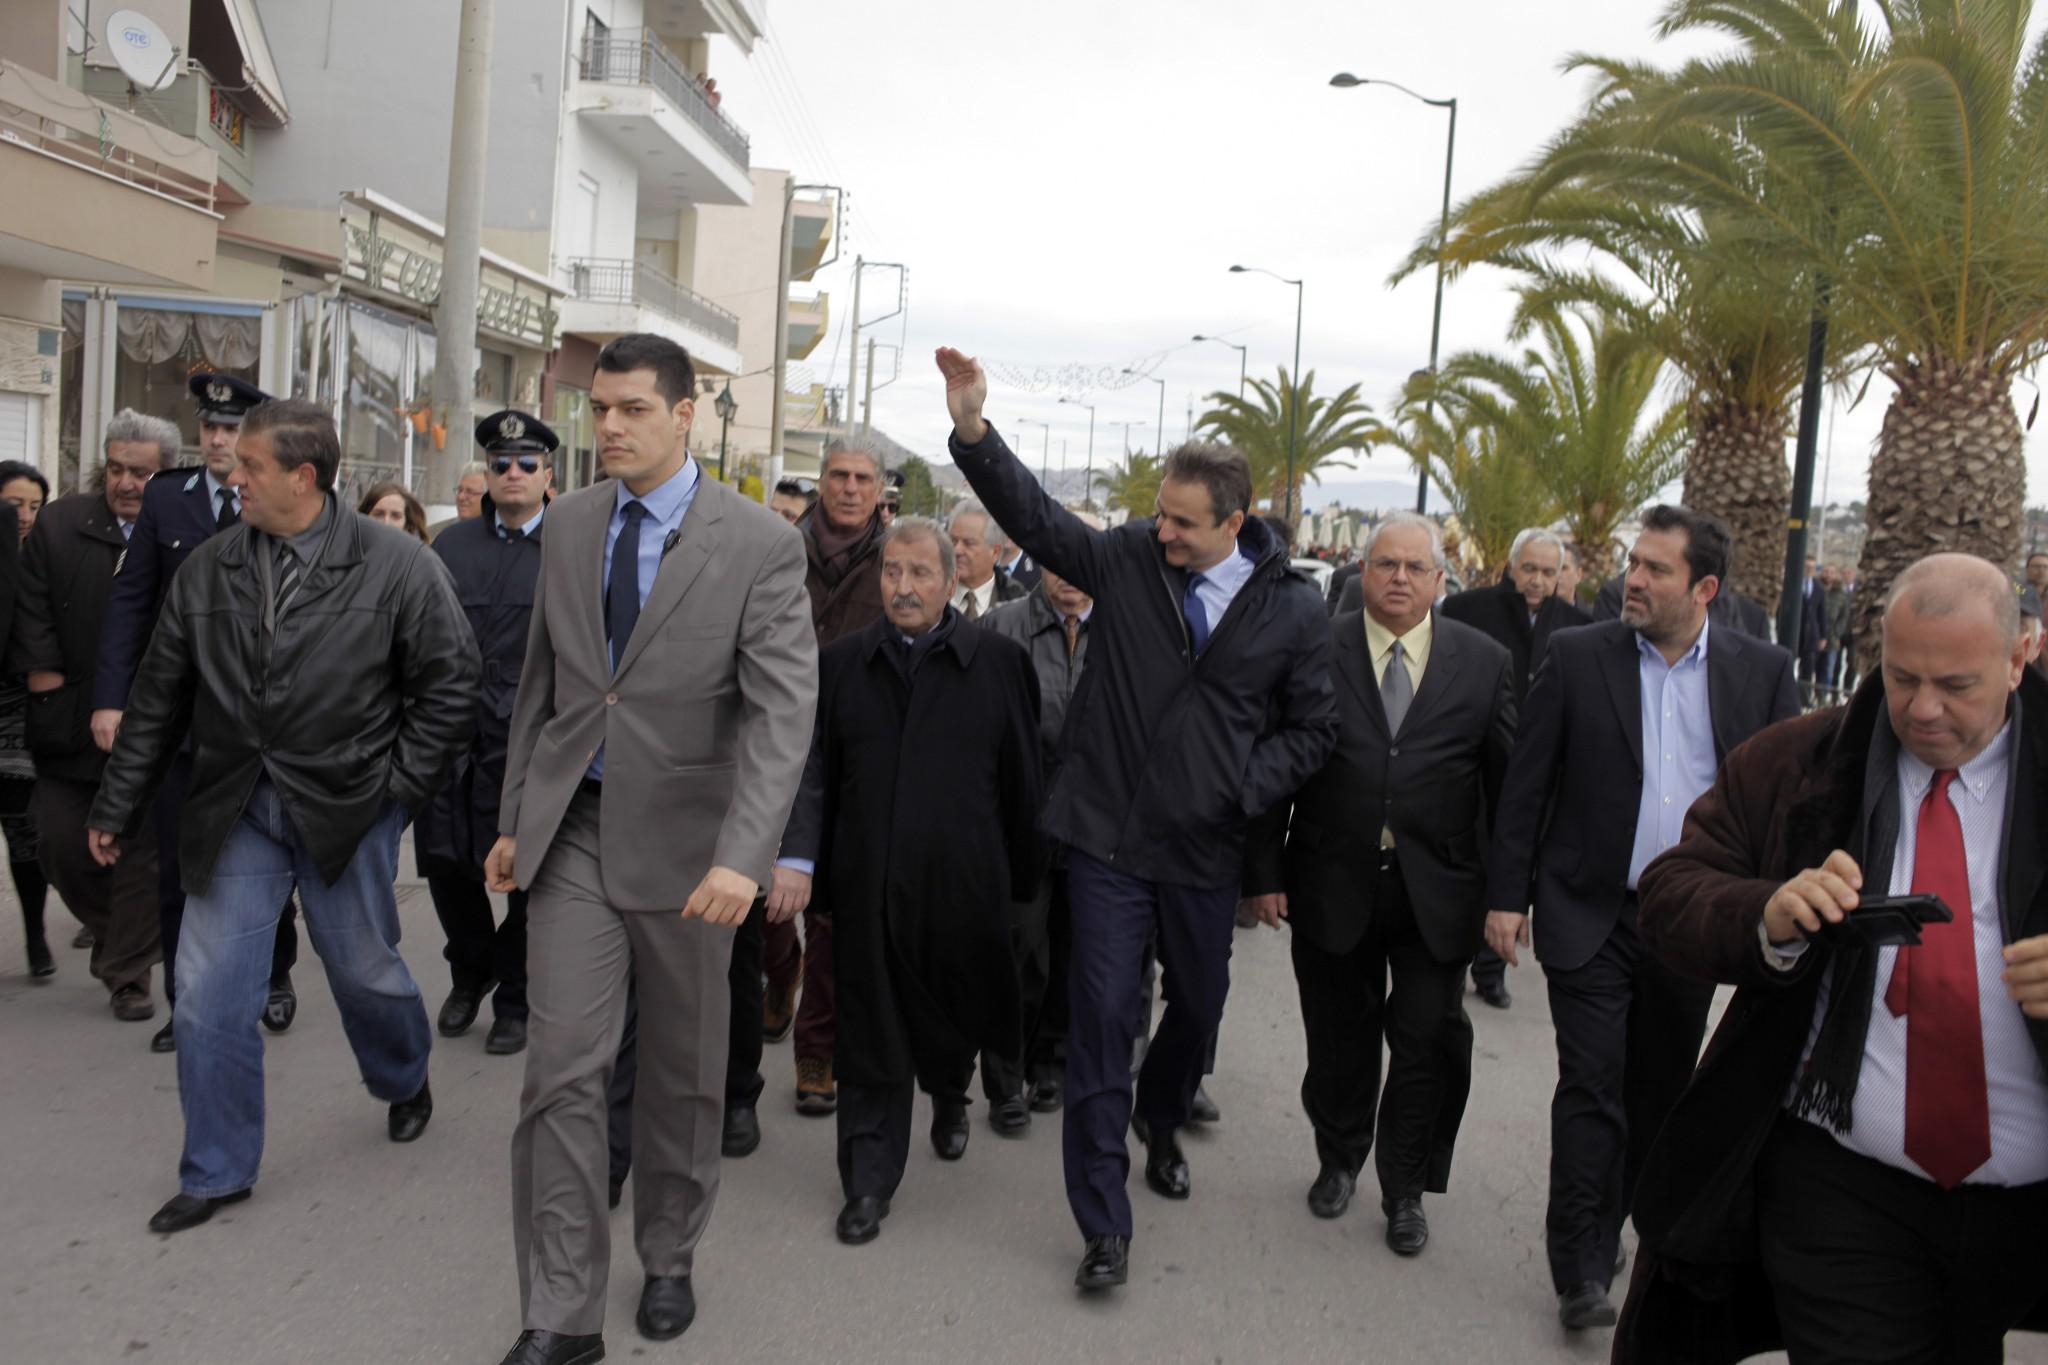 mitsotakis-500 Μητσοτάκης: Είναι άμεση η ανάγκη για ενότητα [εικόνες]